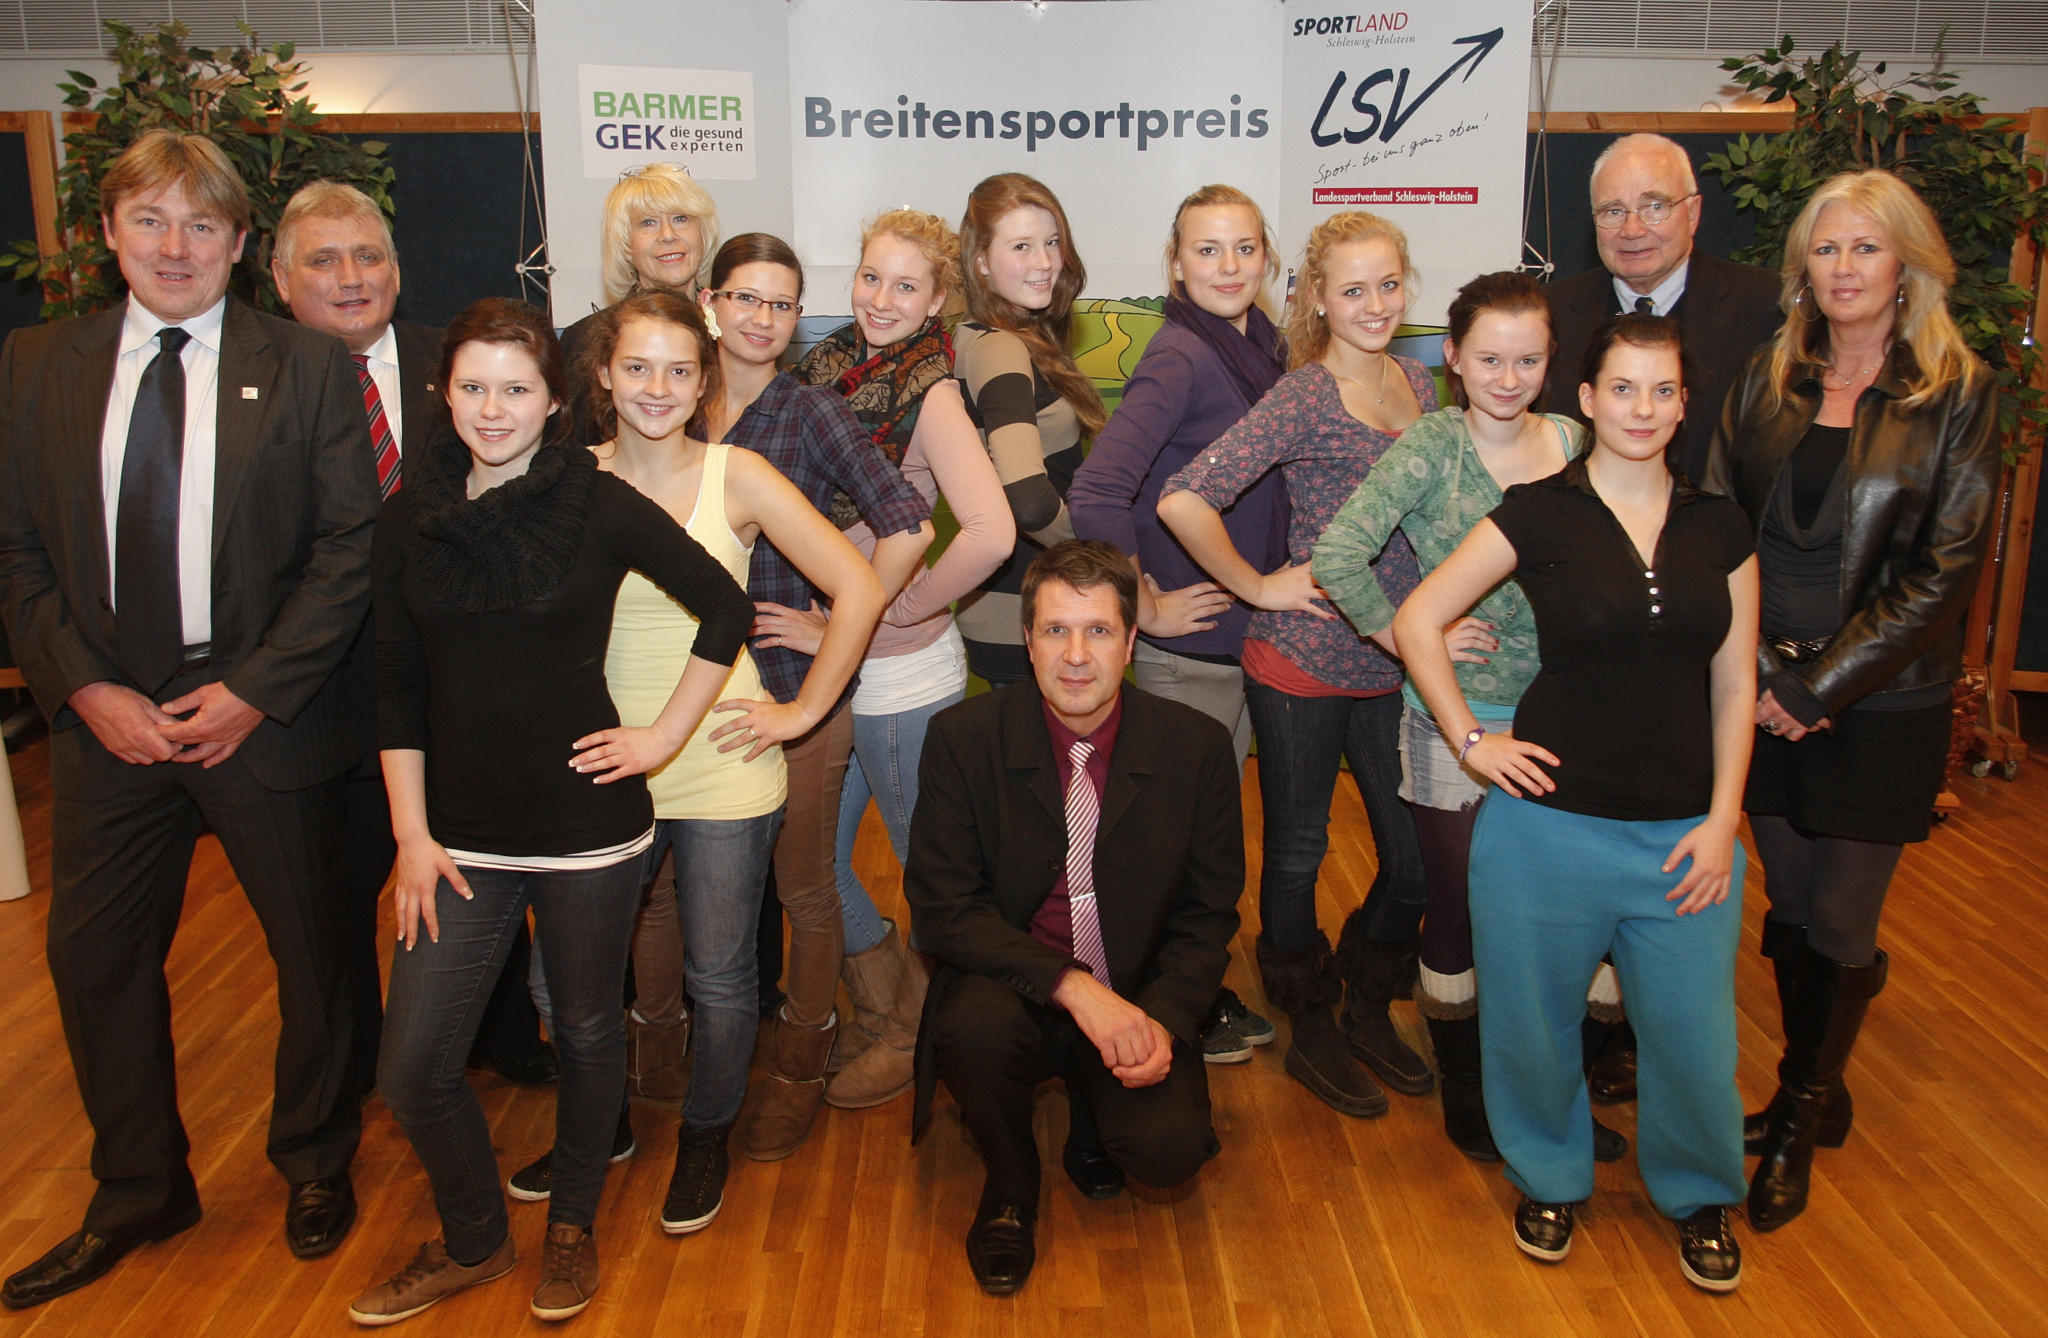 Breitensportpreis 2011